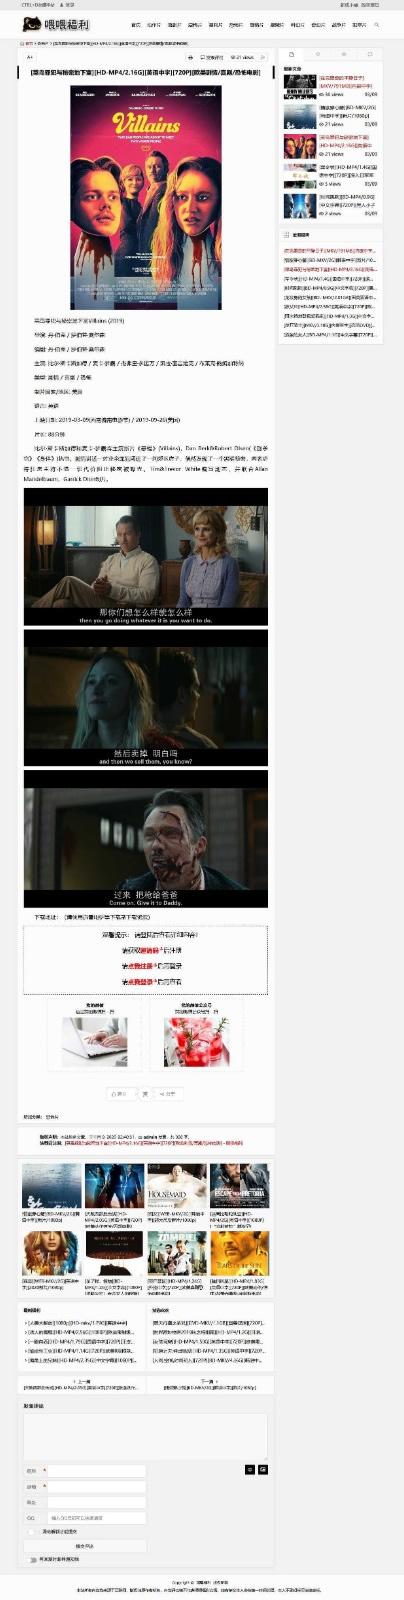 BT电影资源BT种子采集网站源码+手机端